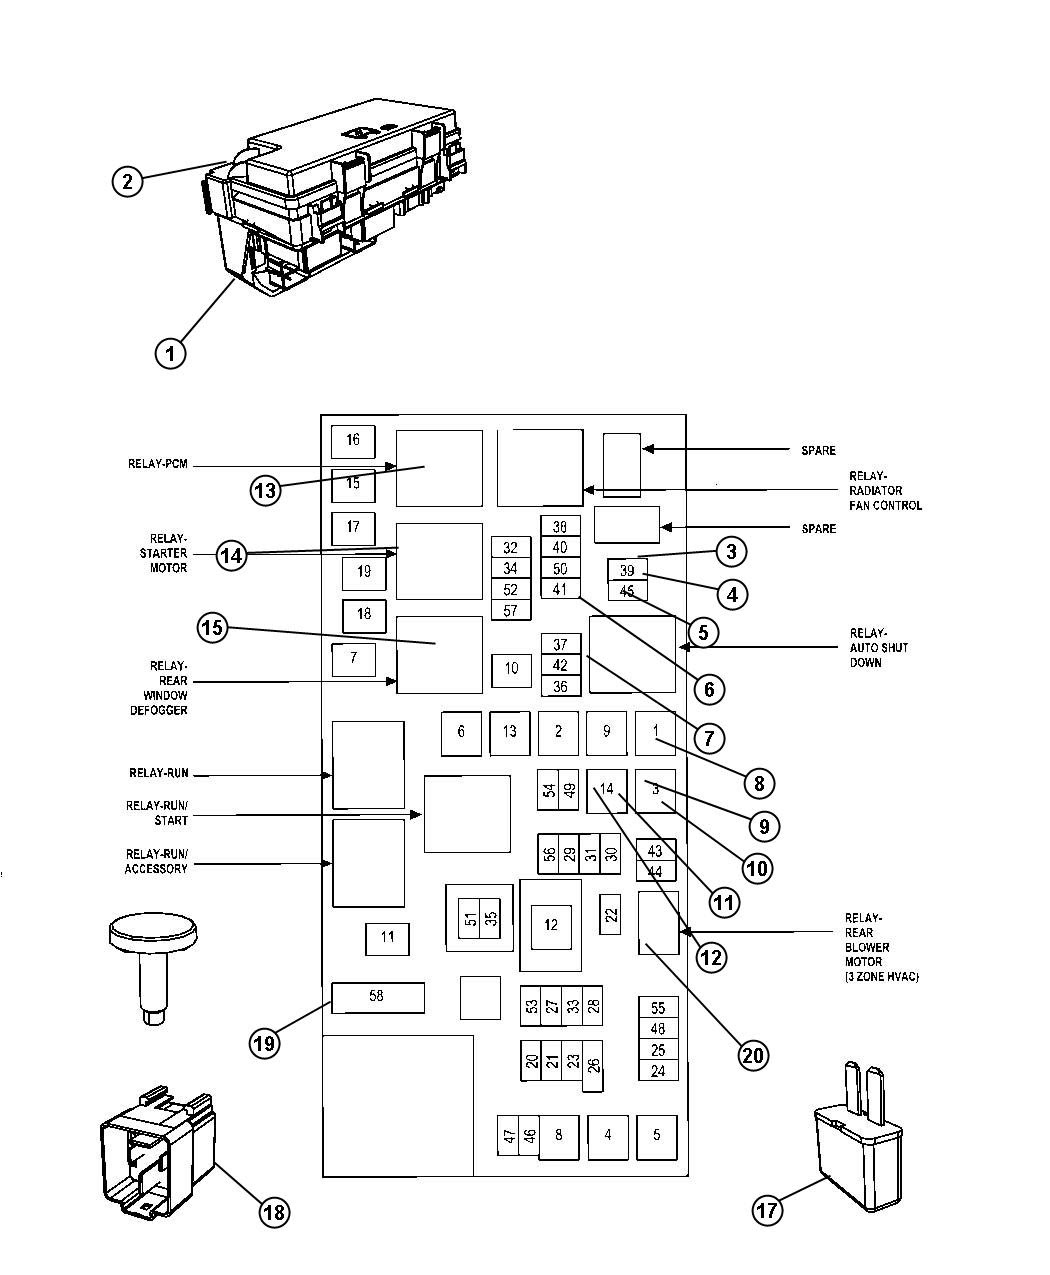 2000 Dodge Intrepid Fuse Box Location